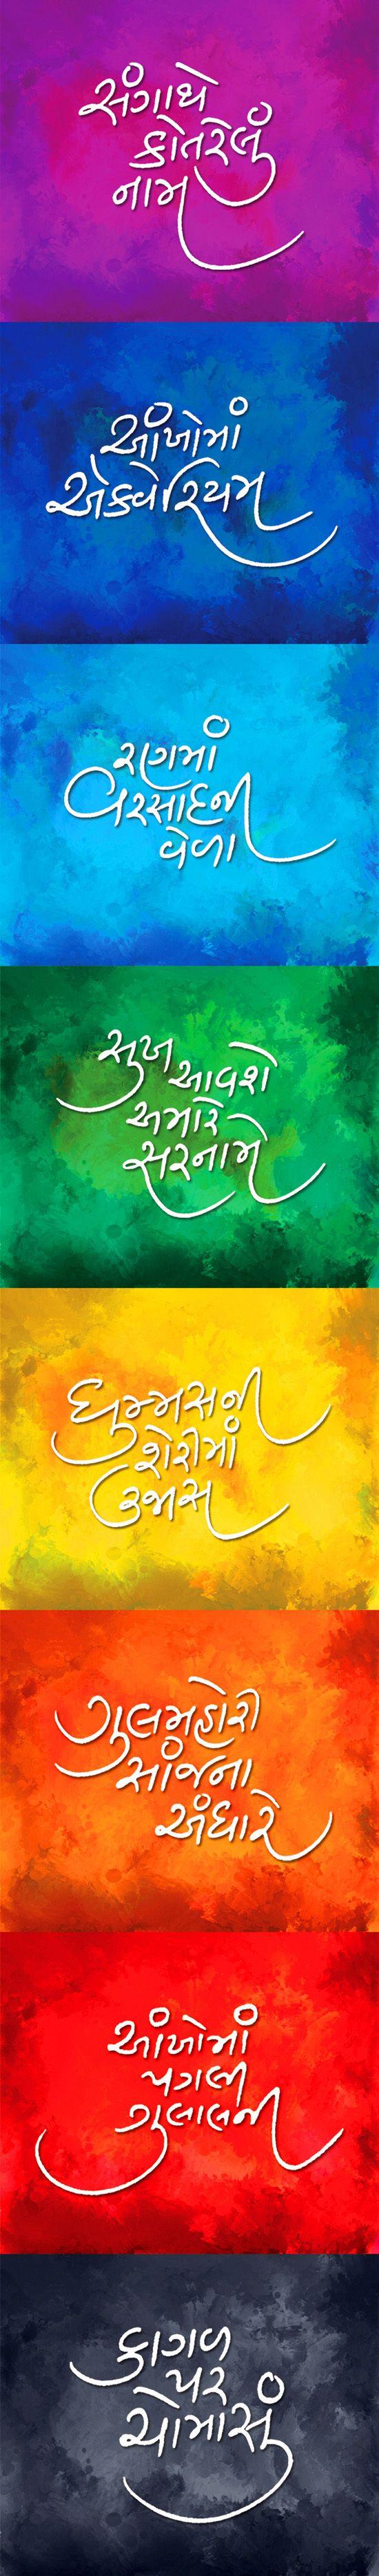 Beautiful Gujarati Typo. Names of Poems